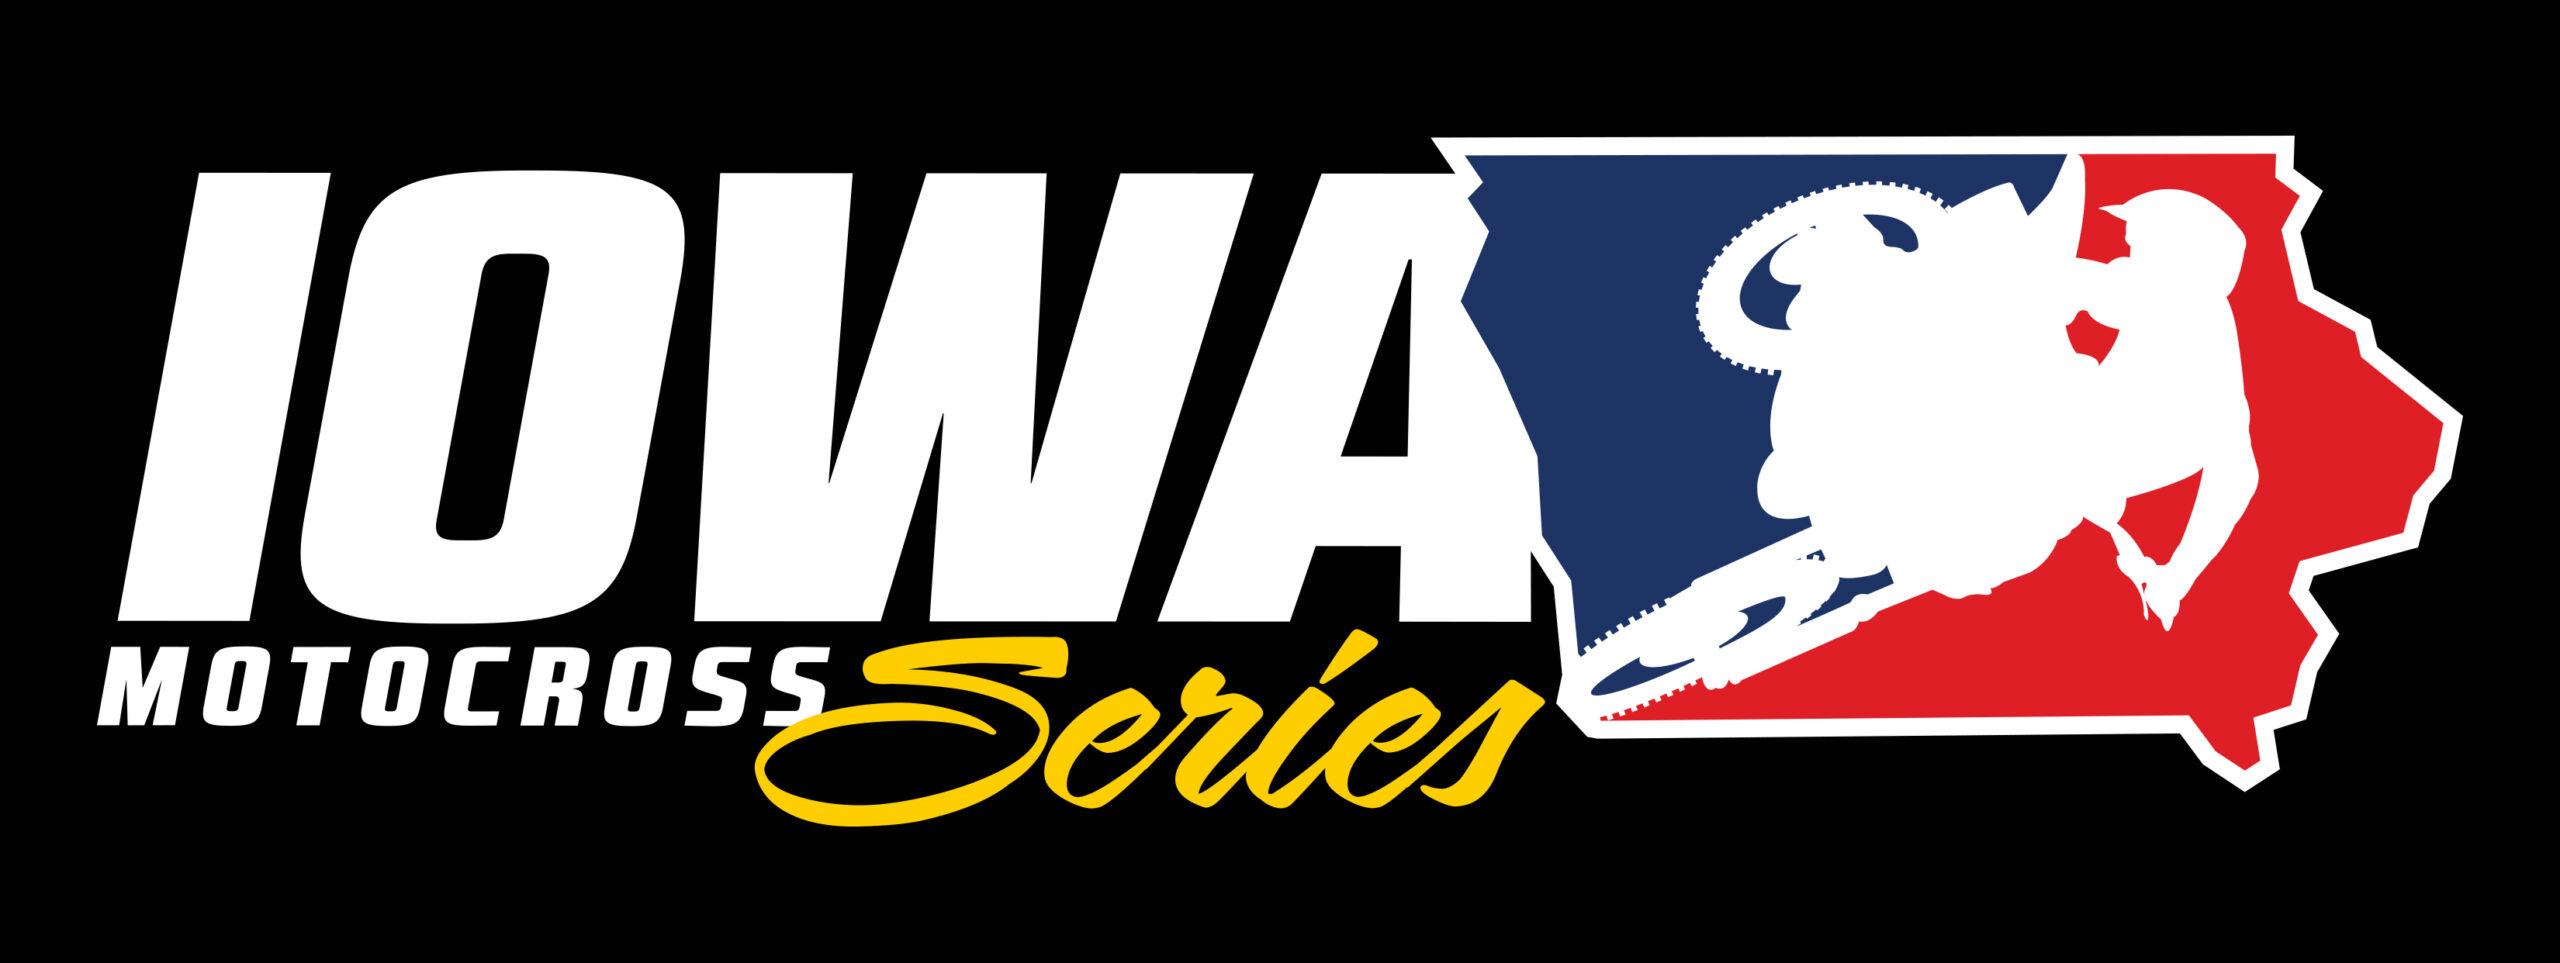 iowa motocross logo